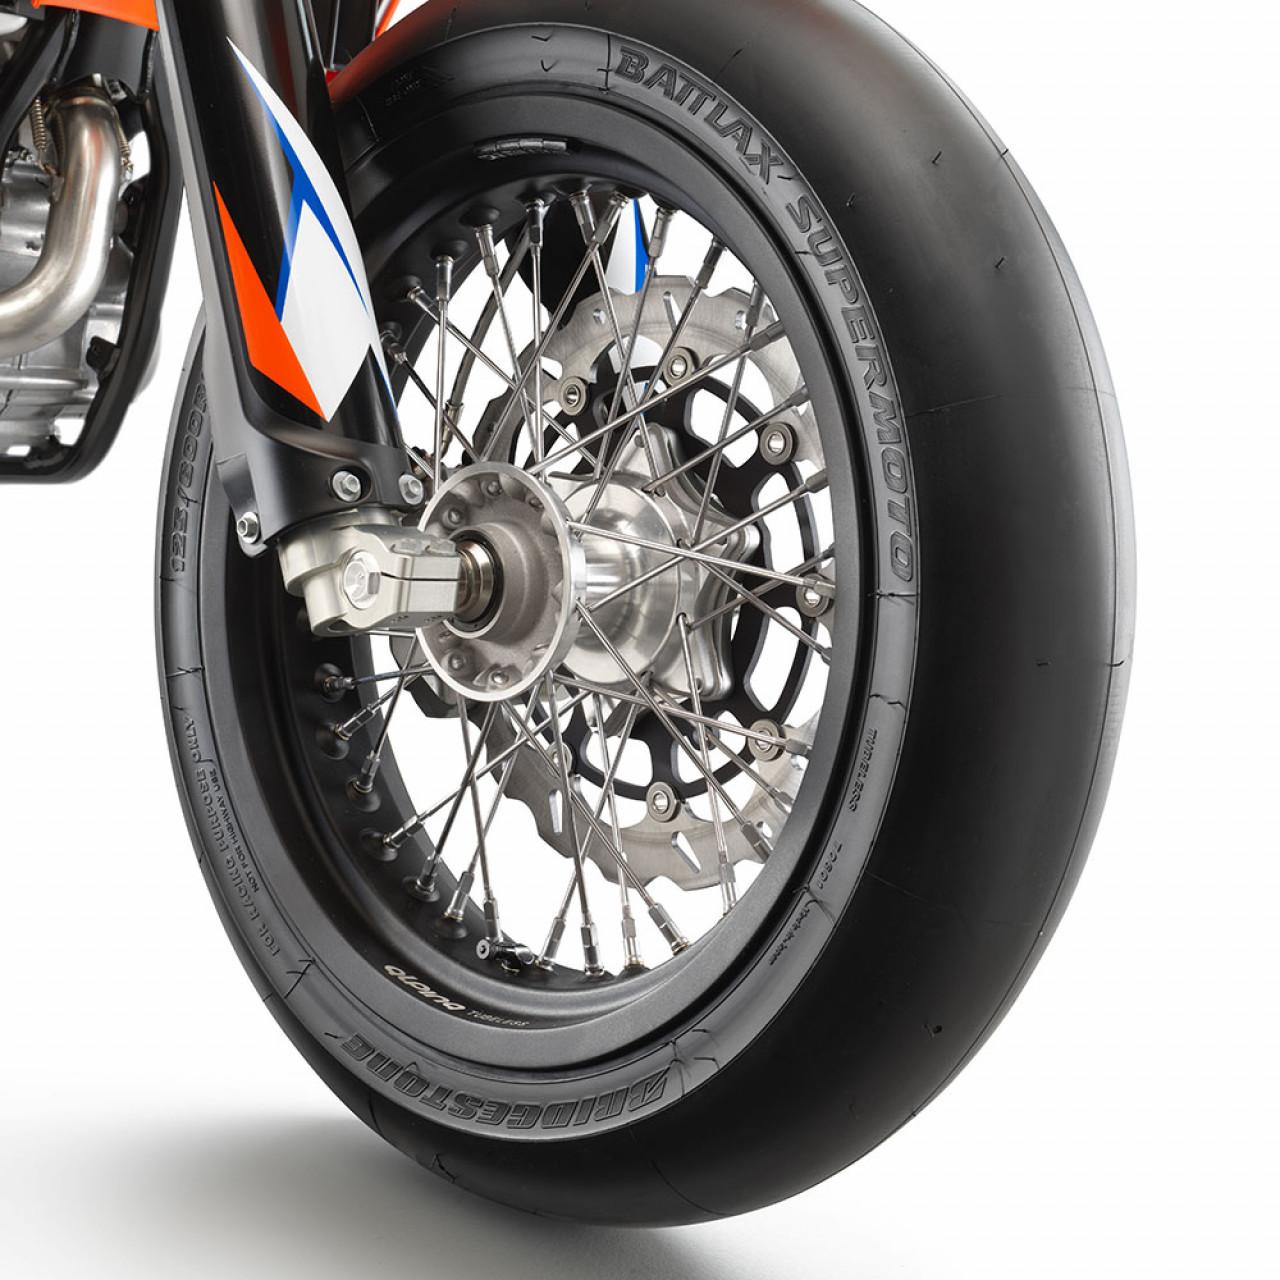 KTM 450 SX-F 2021 - Image 9